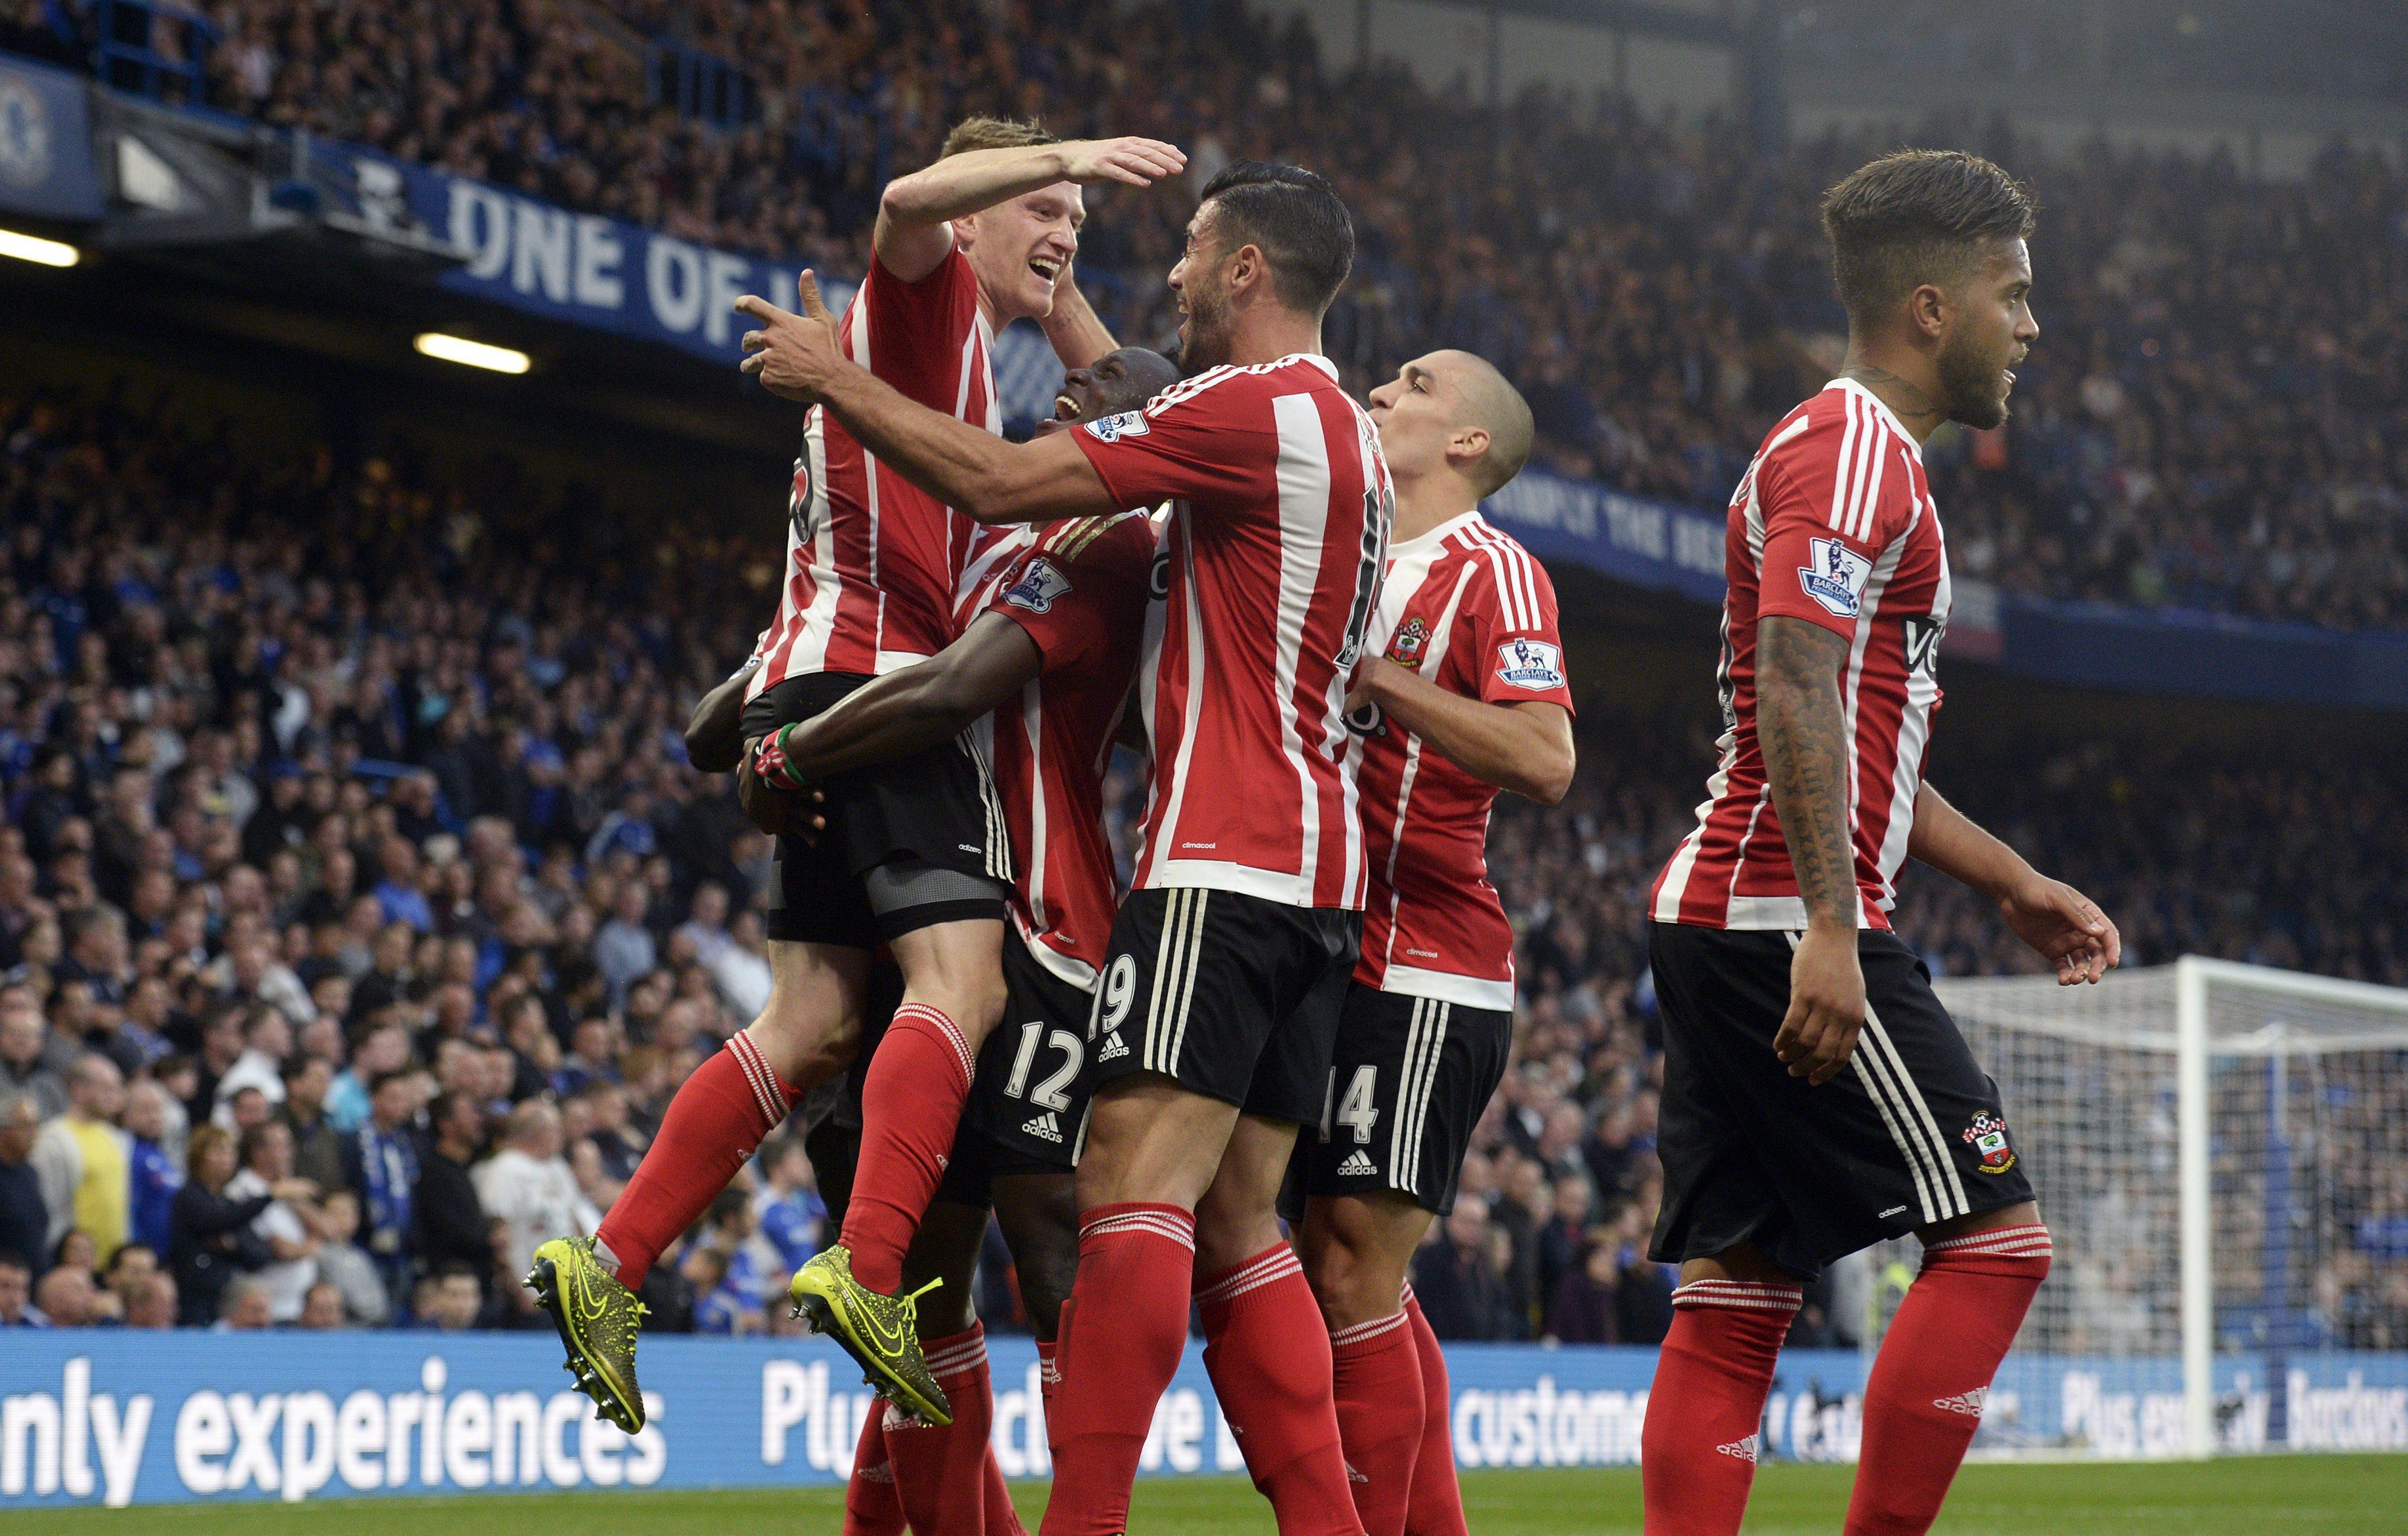 West Brom-Southampton 17 febbraio, analisi e pronostico FA Cup